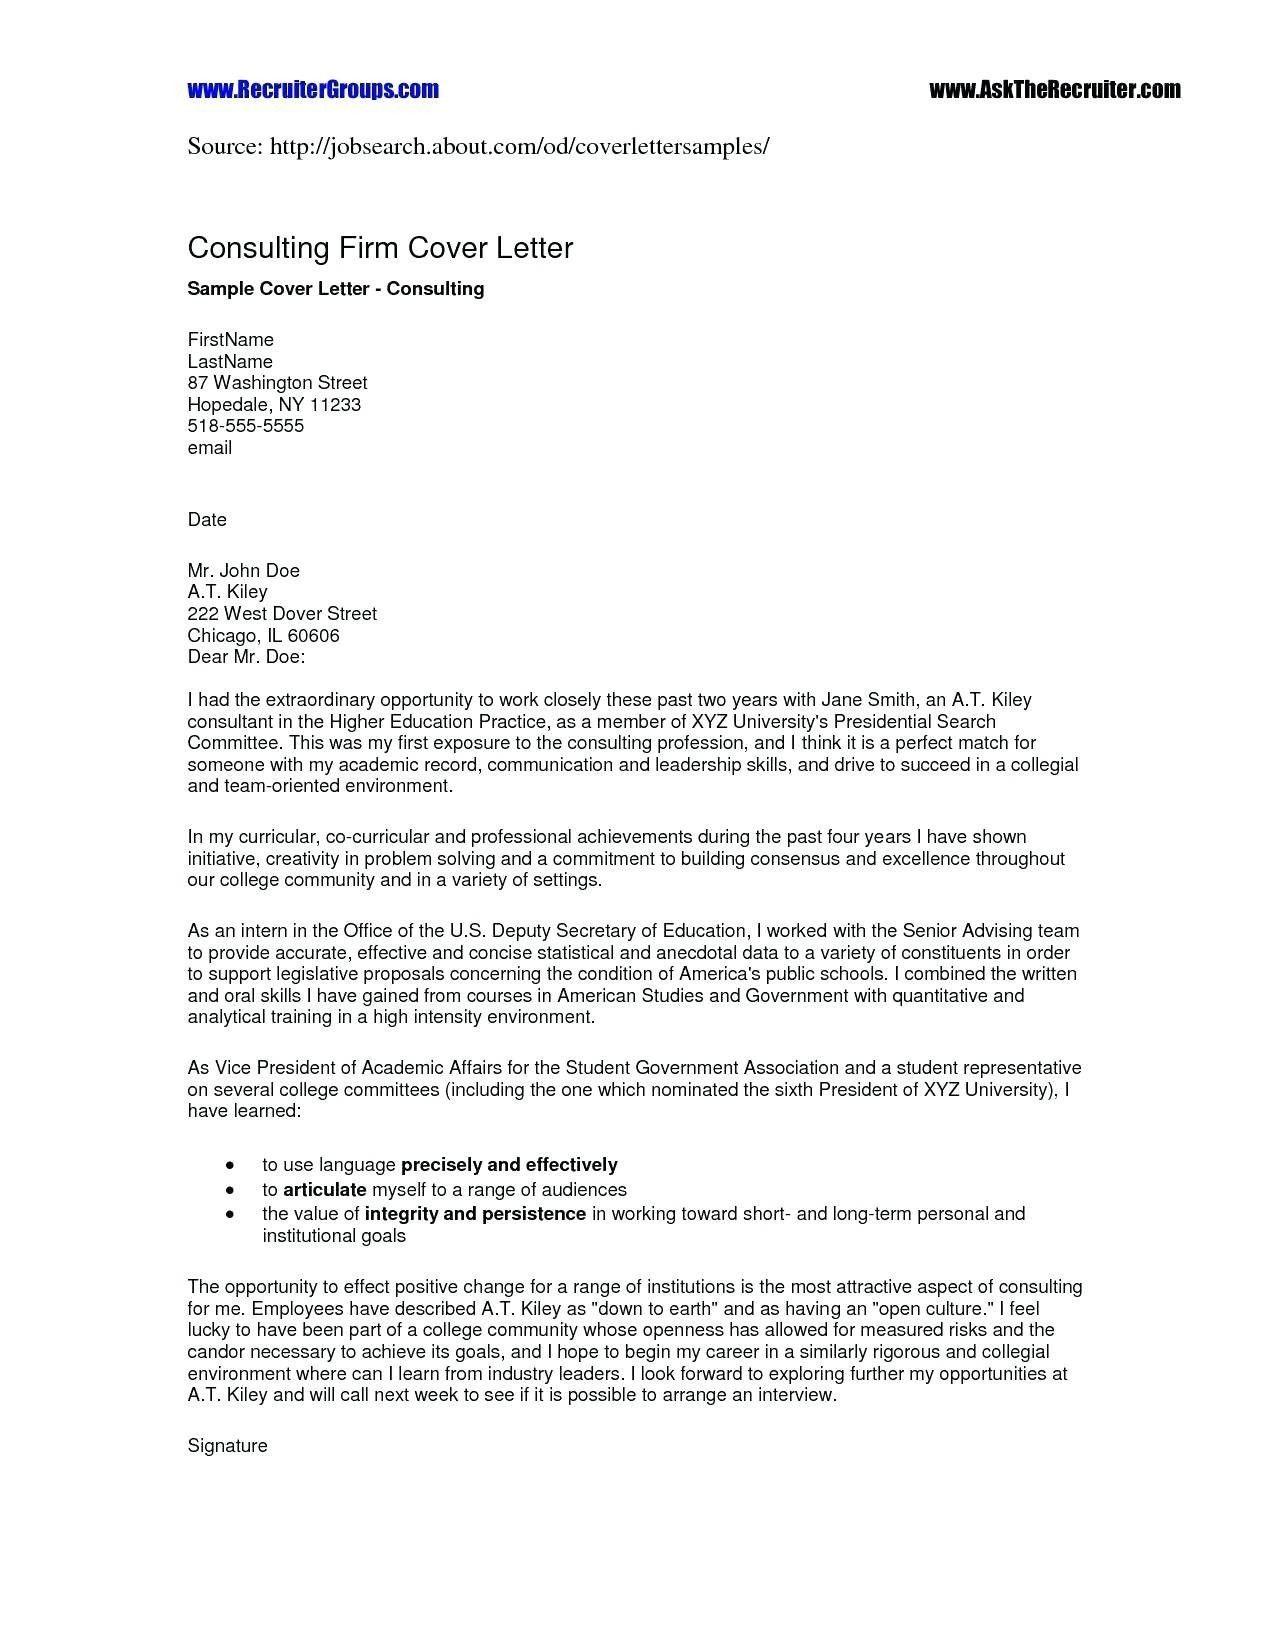 Cover Letter For Job Referral